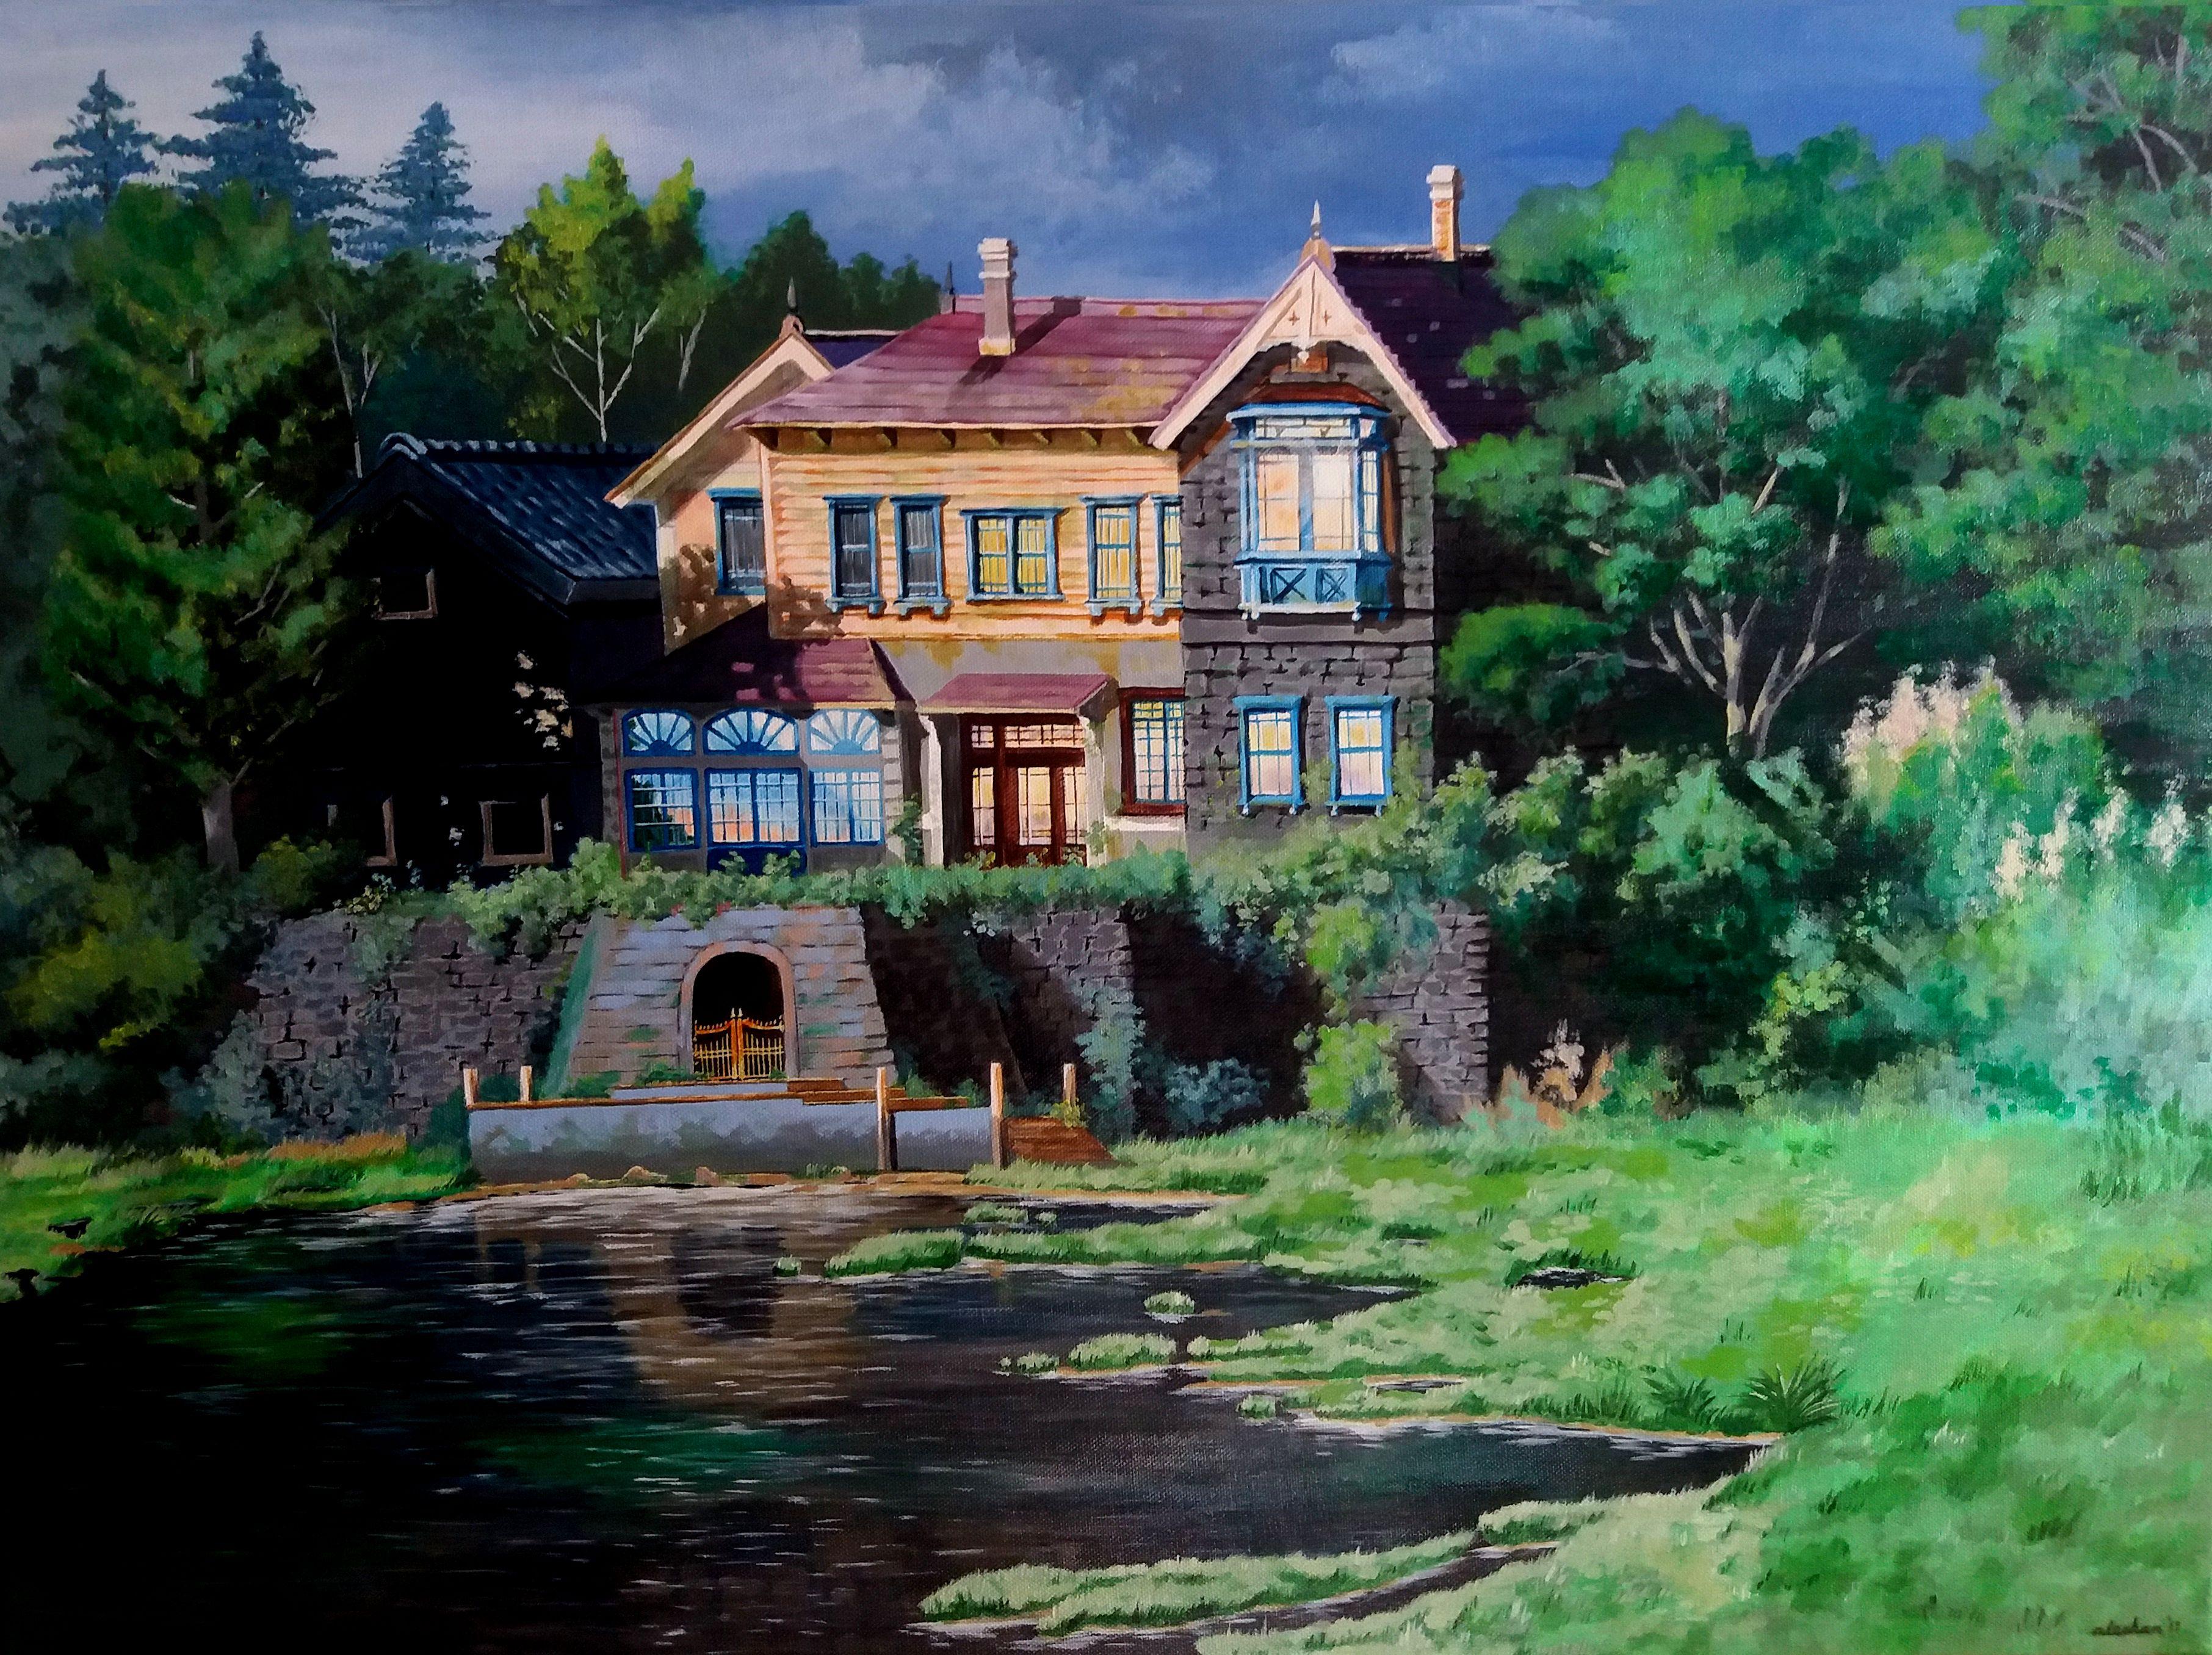 When Marnie Was There Omoide No Mani Mansion Acrylic Painting Studio Ghibli Studio Ghibli Painting Studio When Marnie Was There